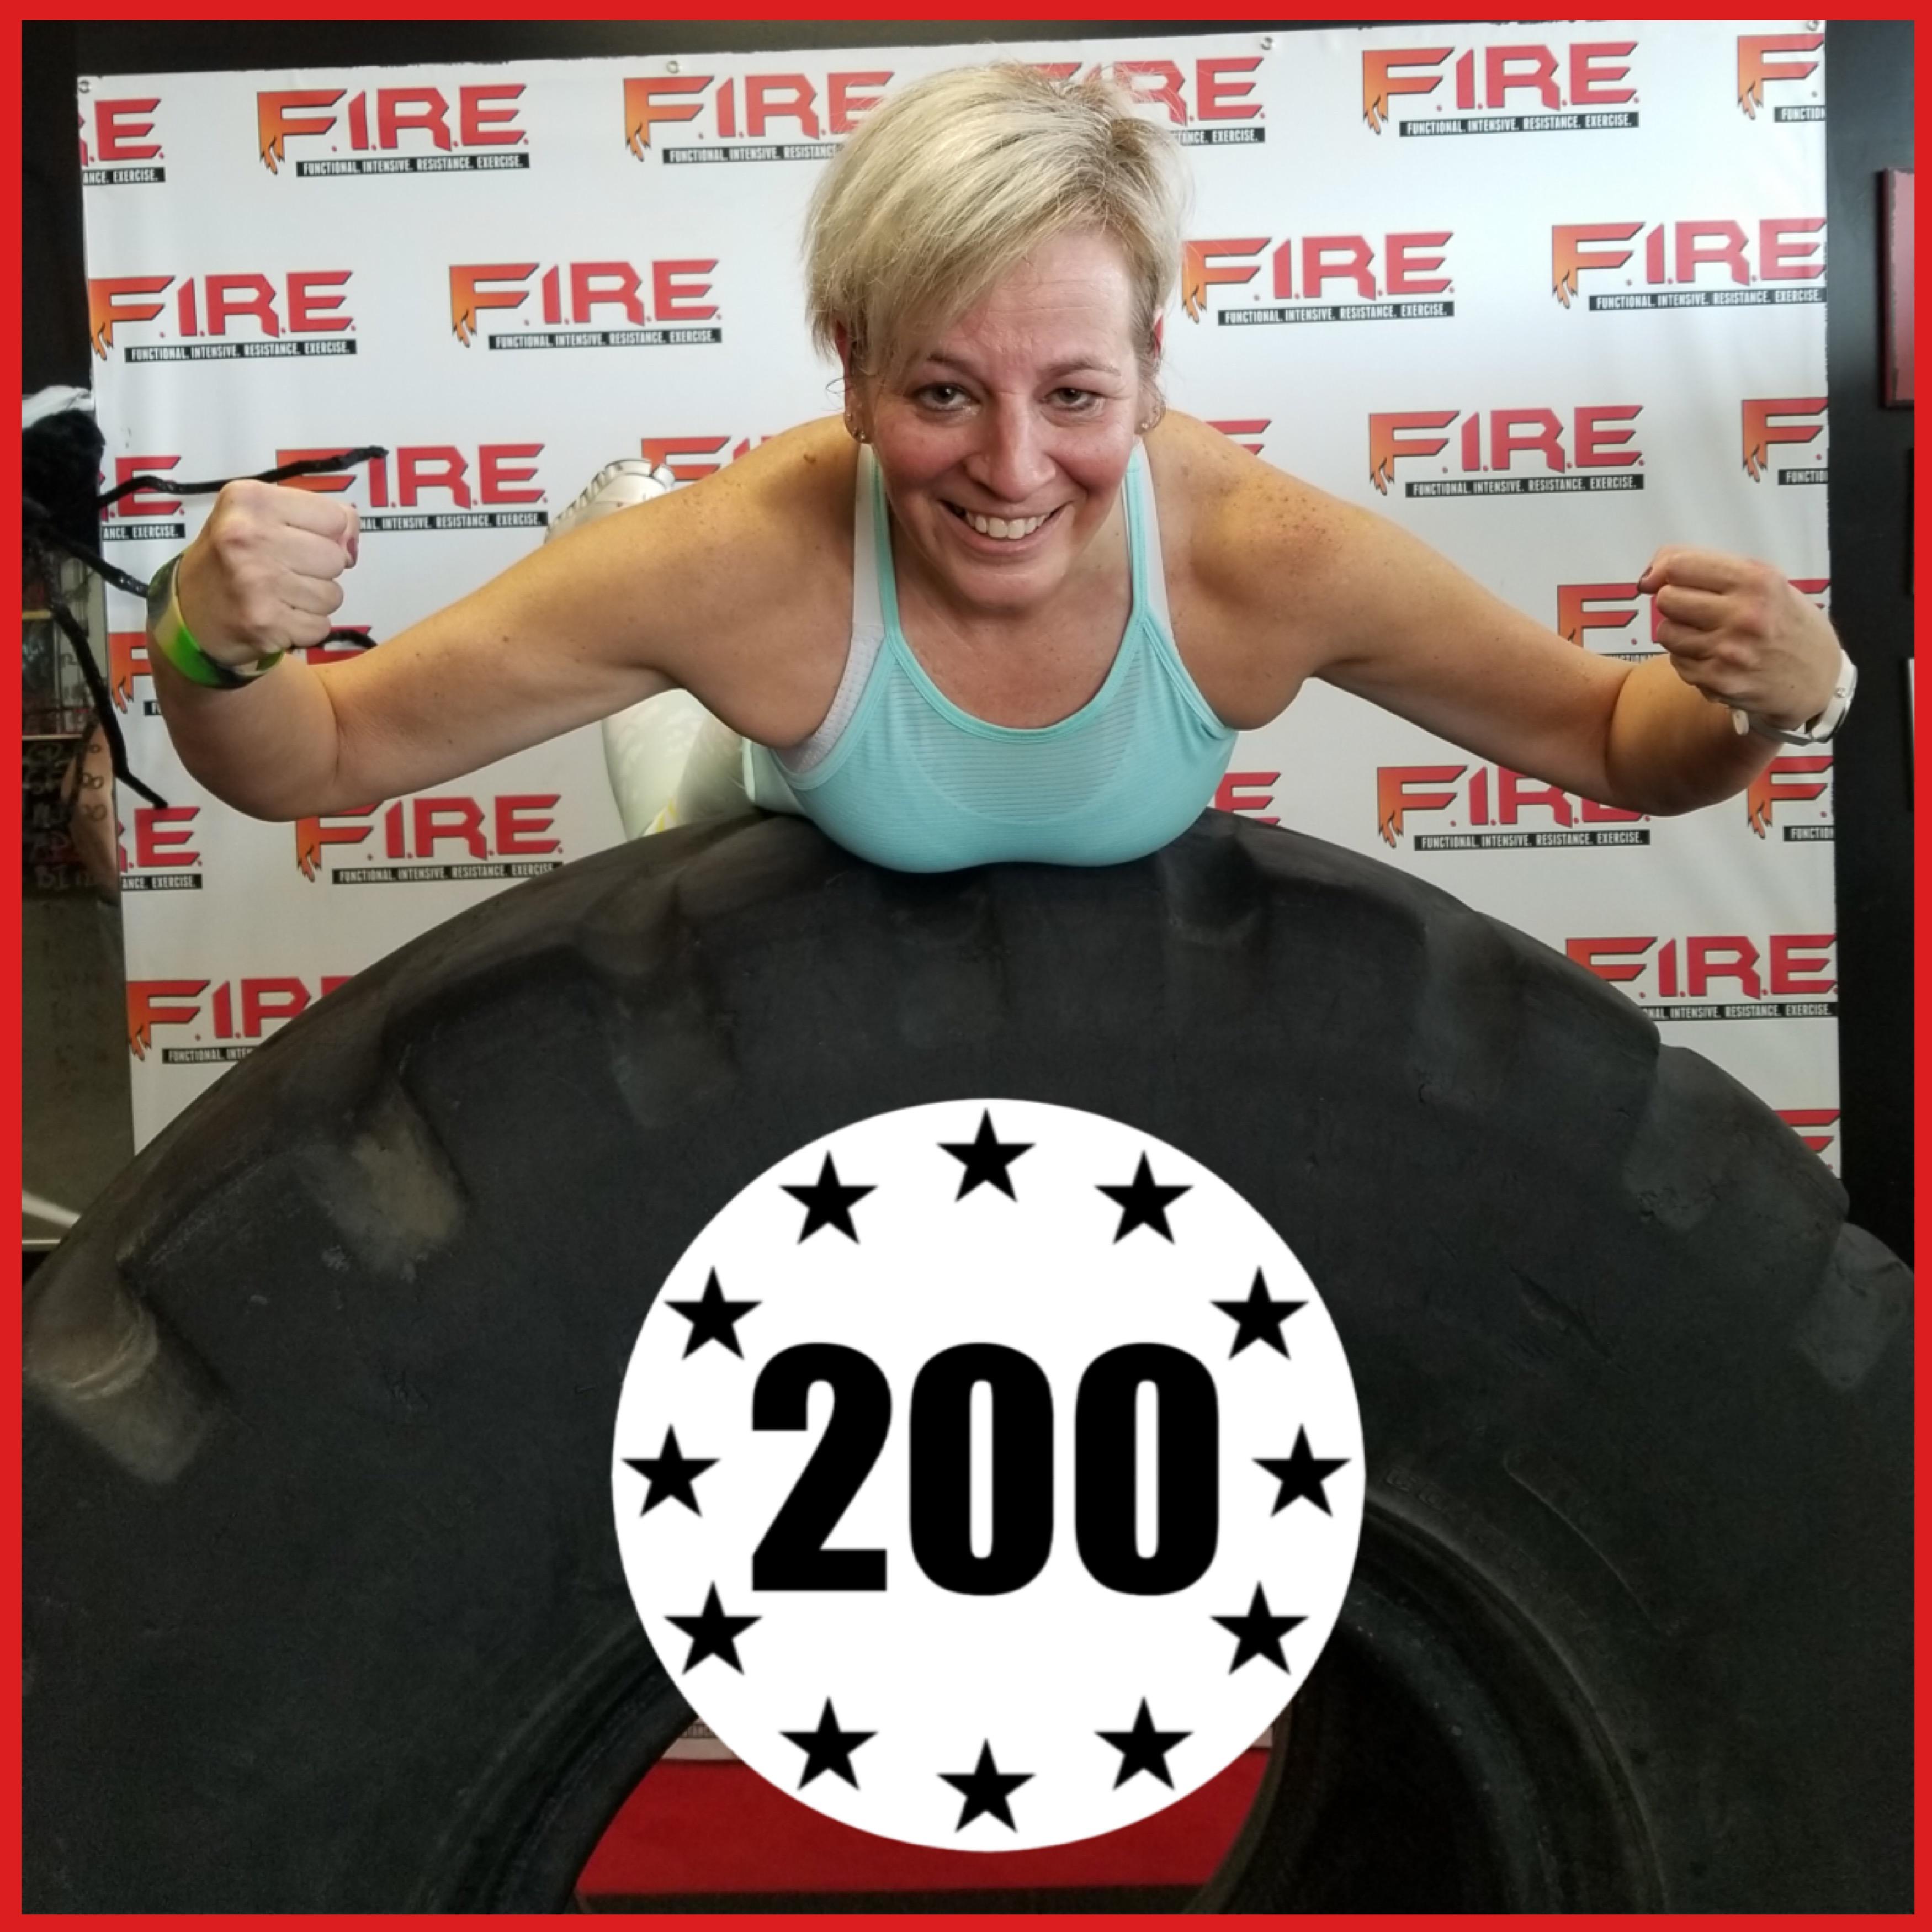 MeganA200